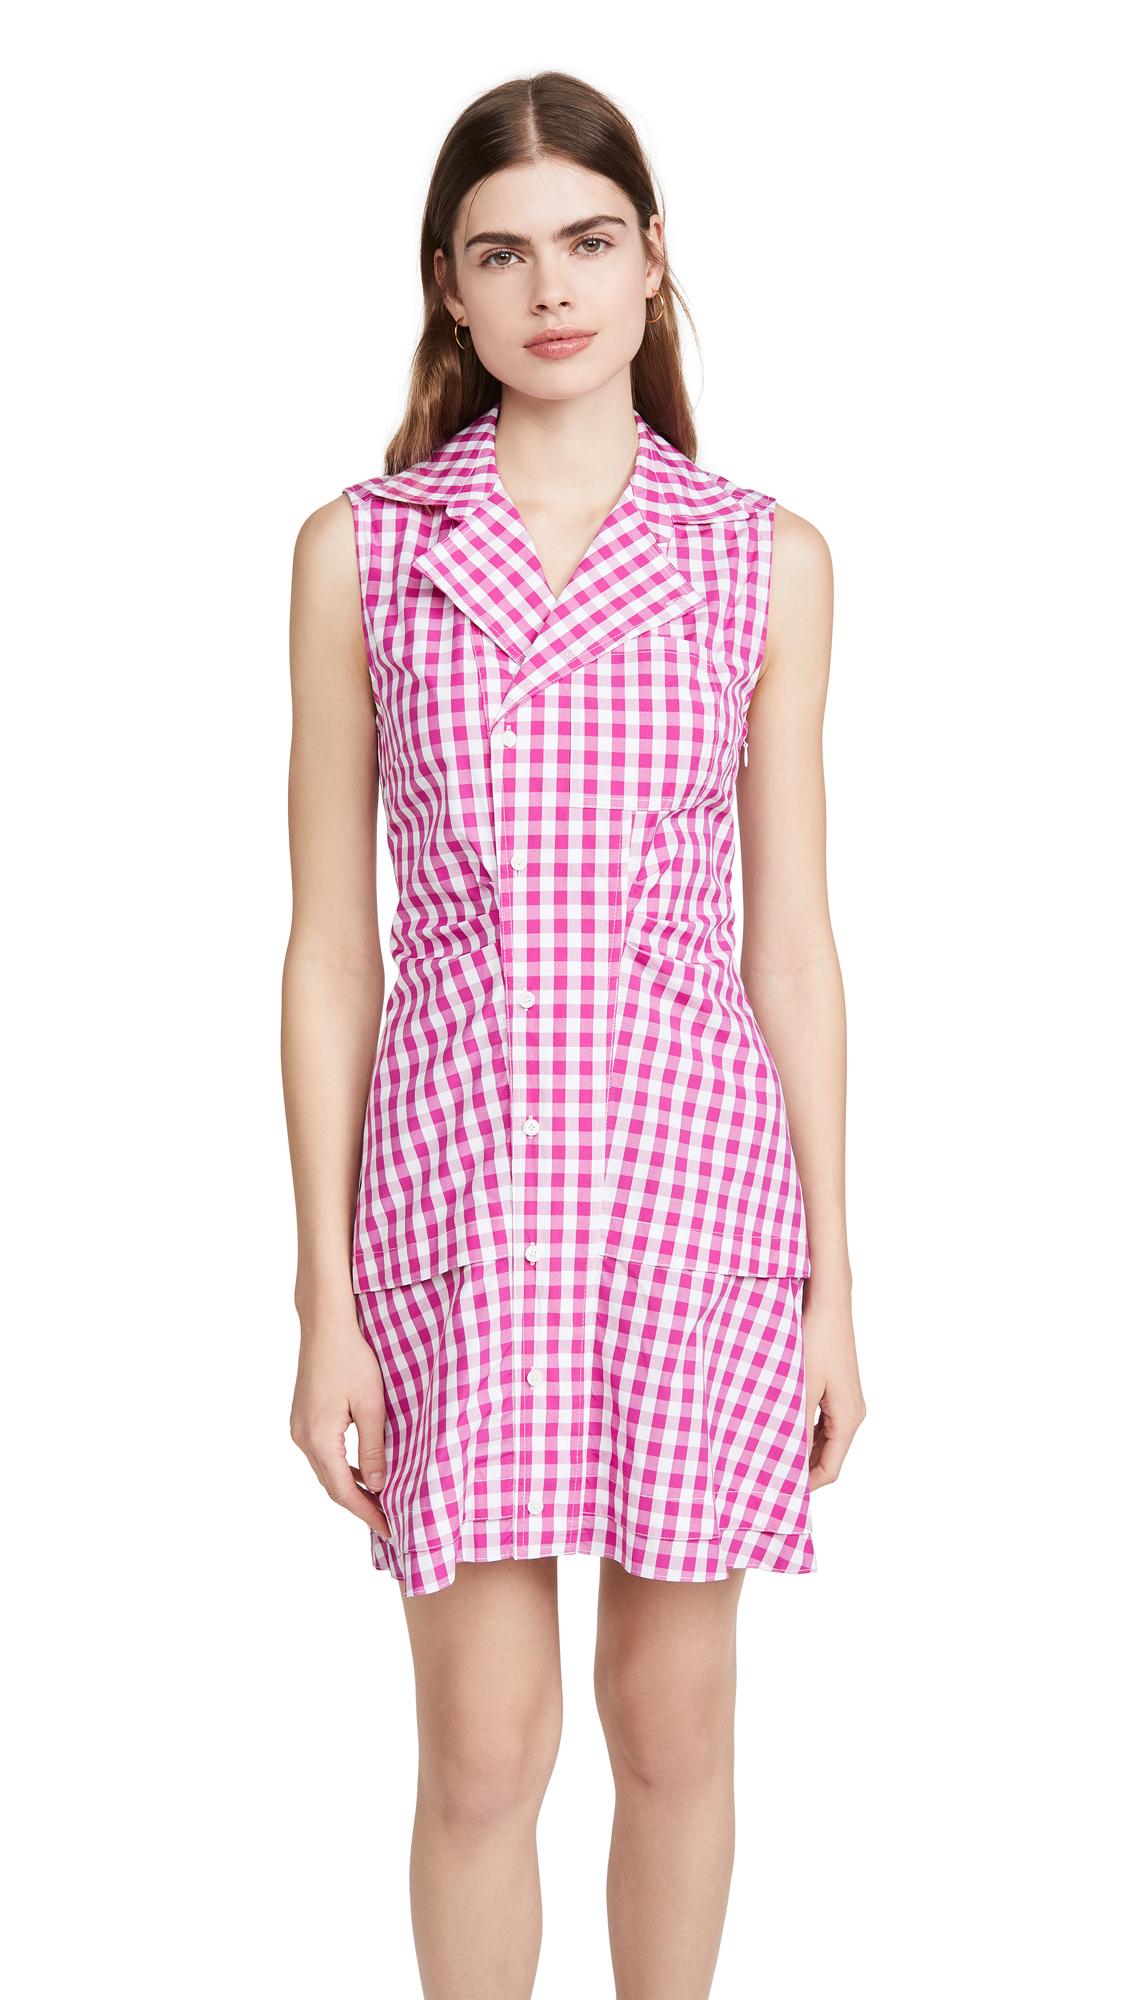 Derek Lam 10 Crosby Satina Sleeveless Shirt Dress - 30% Off Sale